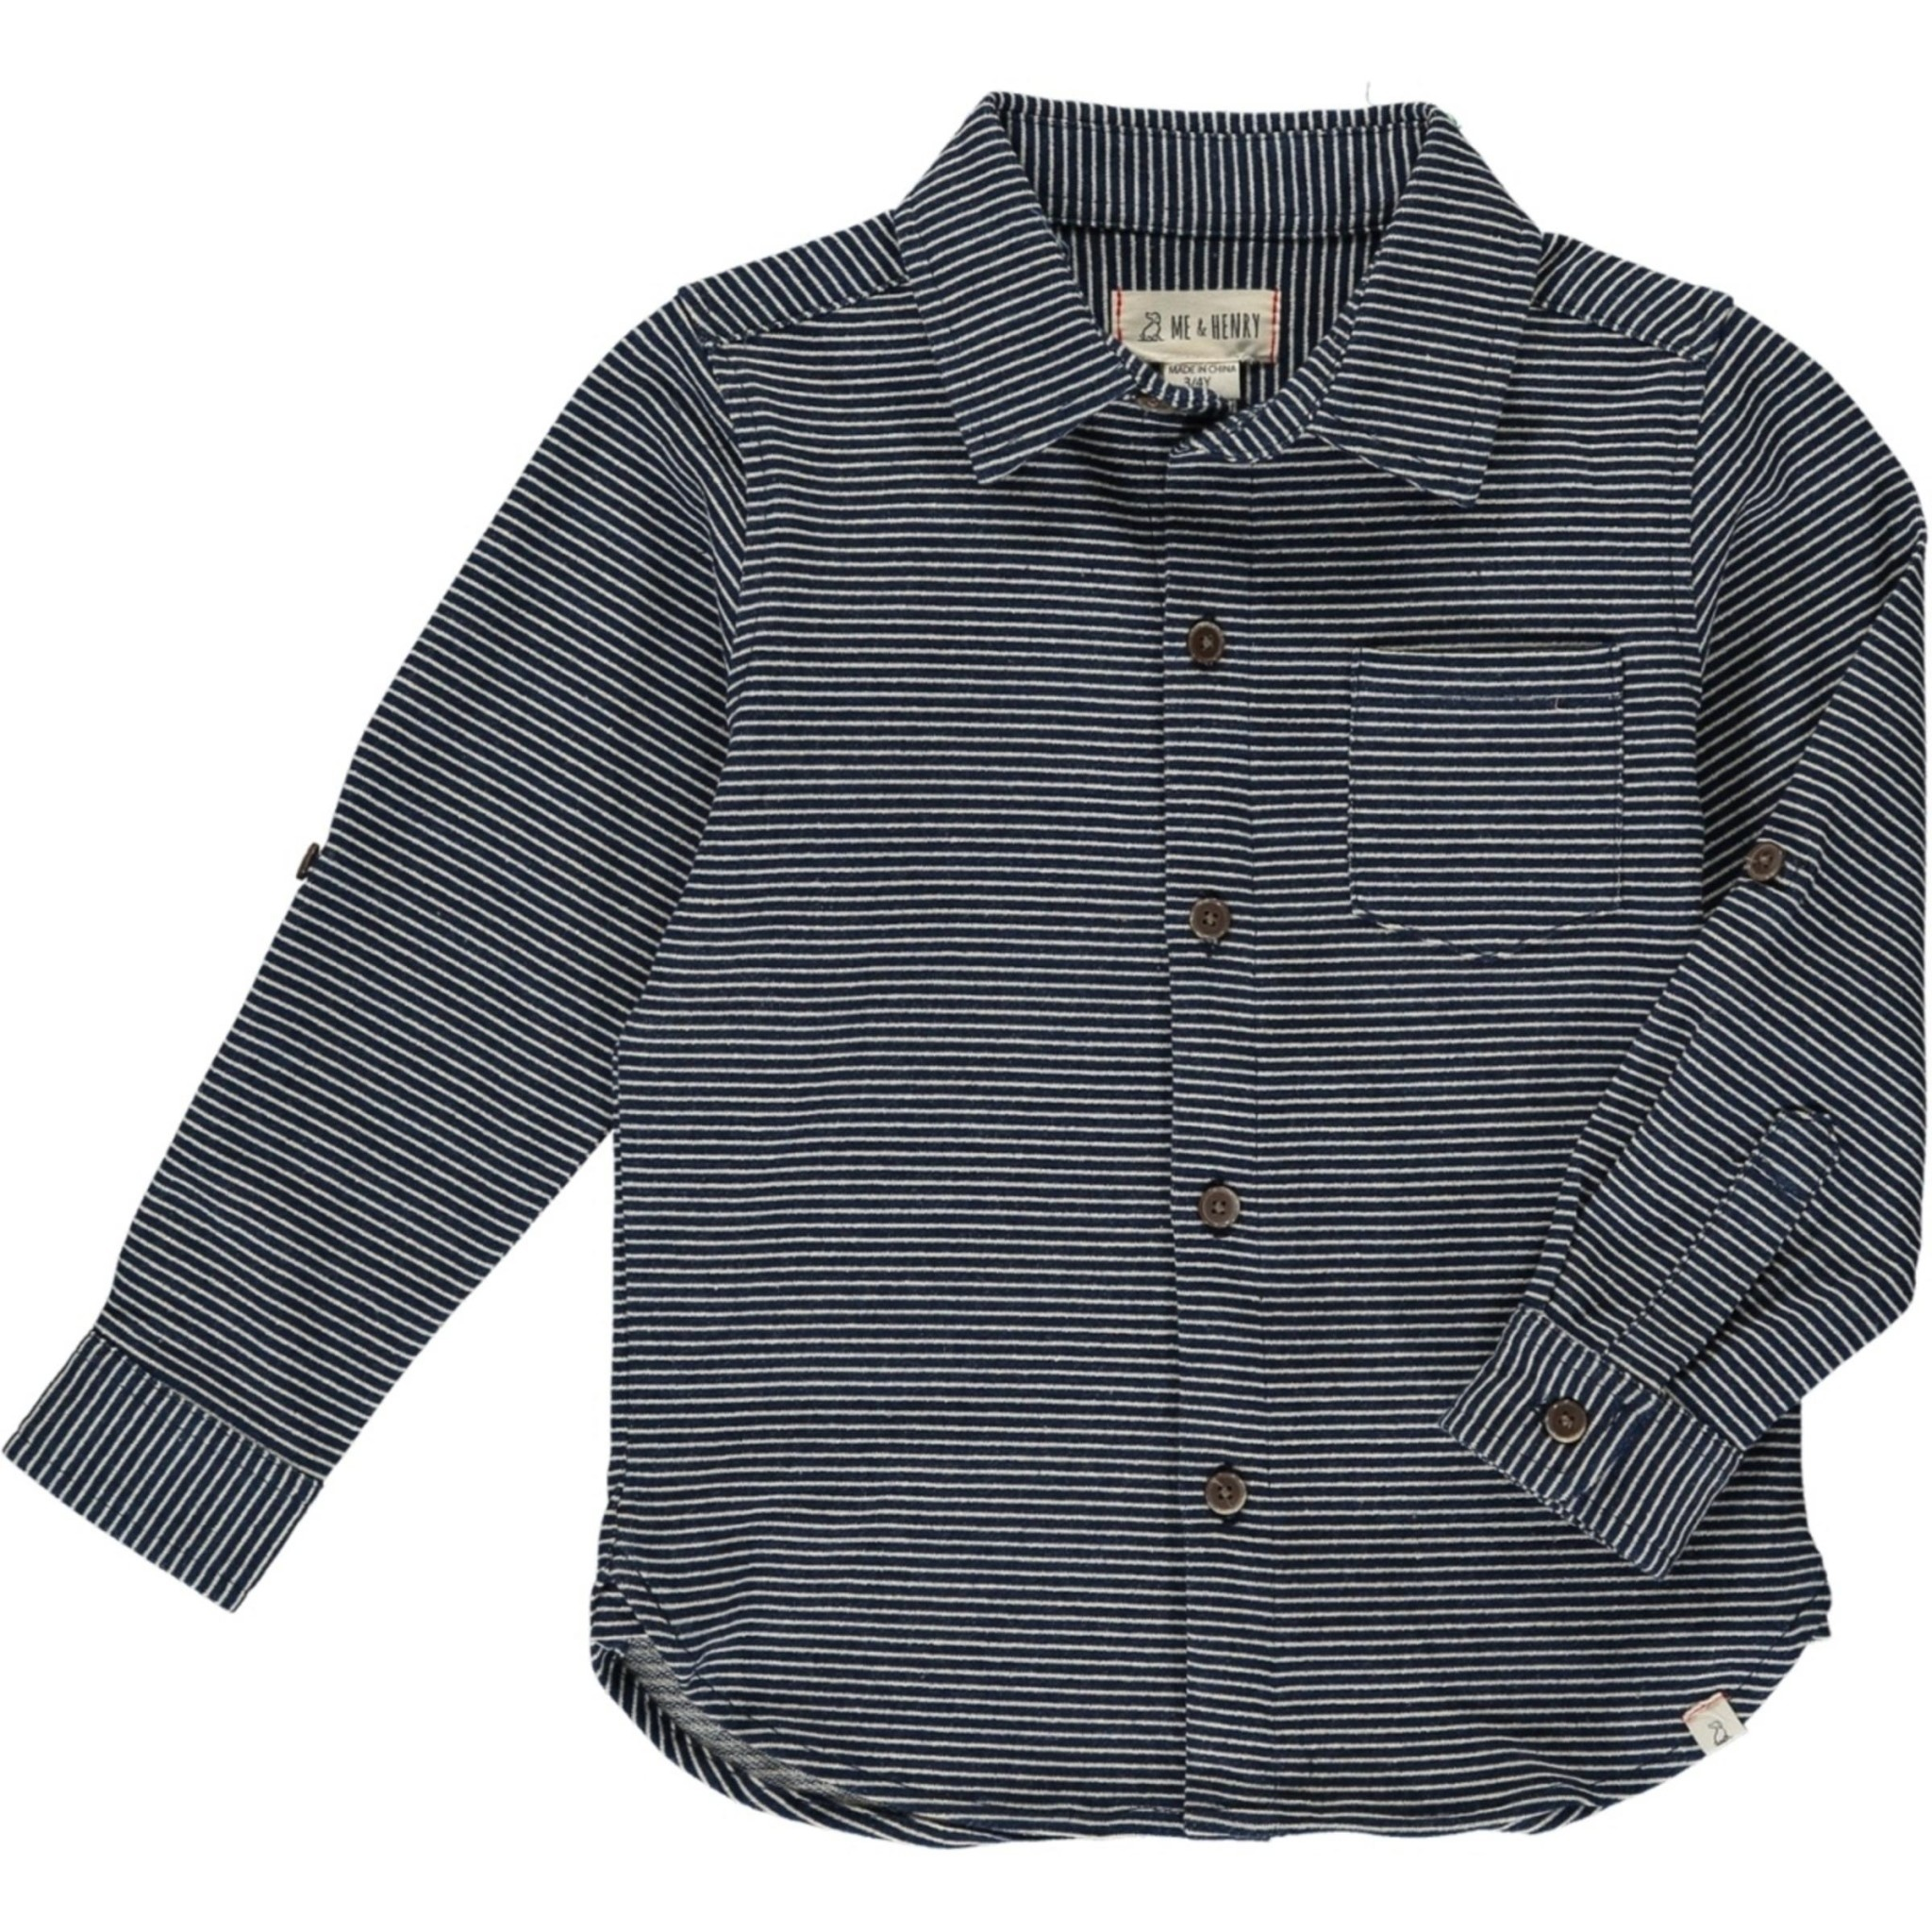 Me & Henry Blue/White Stripe Jersey Shirt